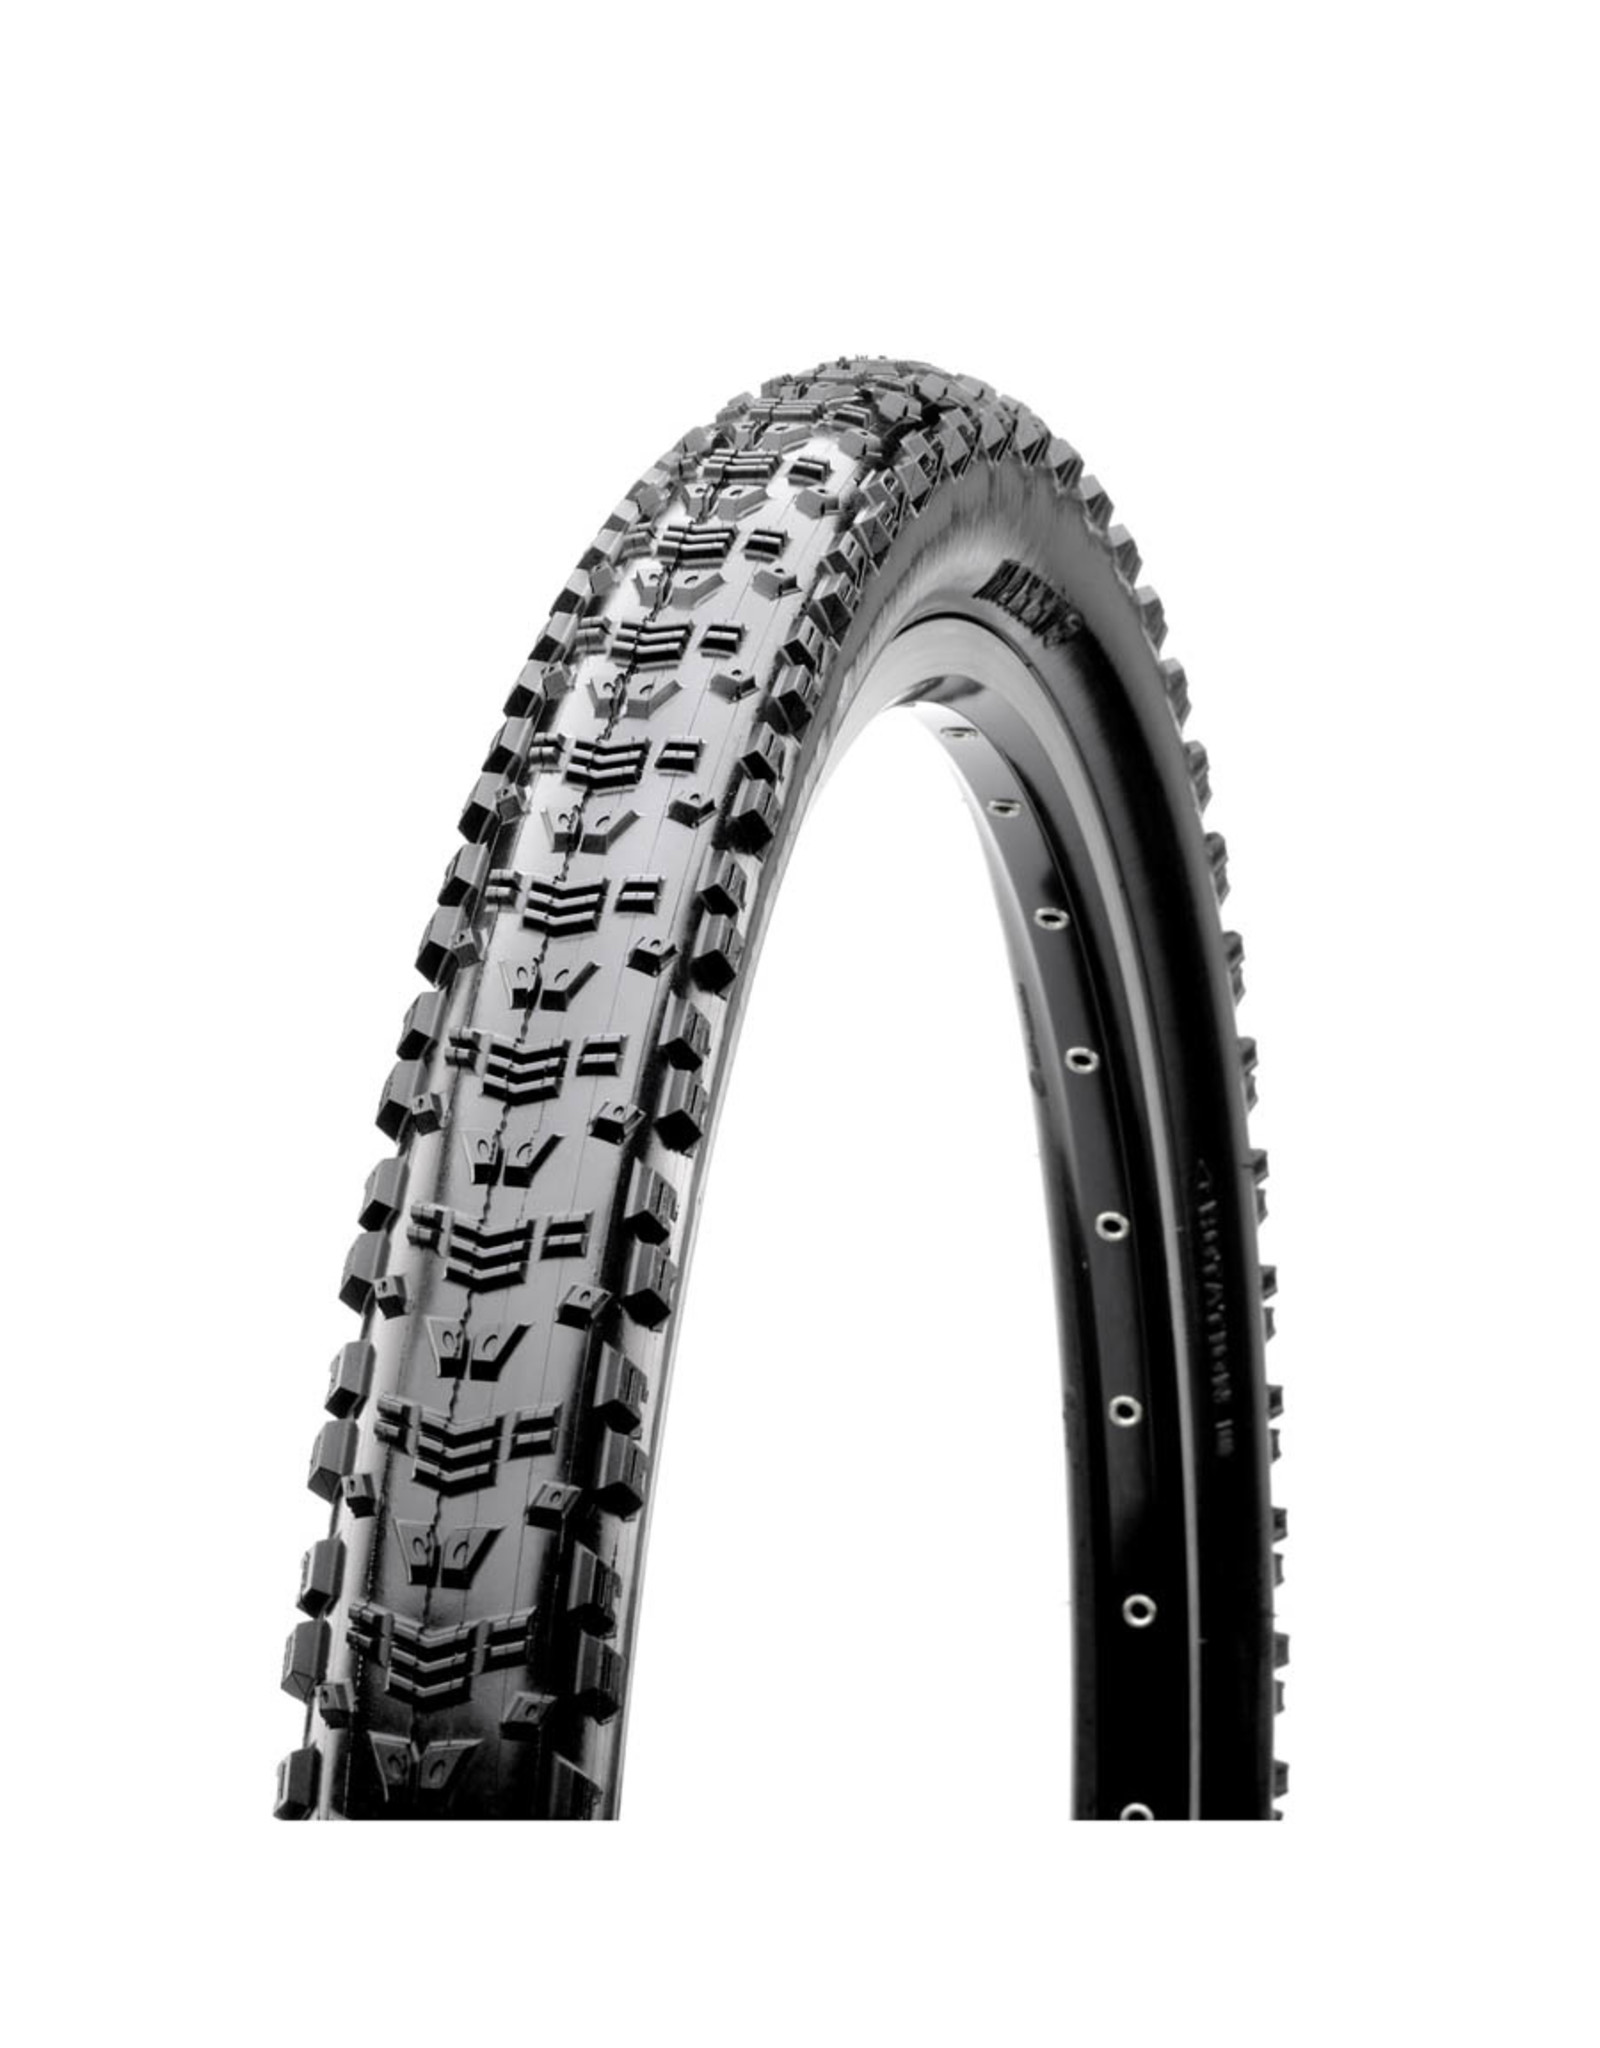 Maxxis, Aspen, Tire, 27.5''x2.25, Folding, Tubeless Ready, Dual, EXO, 120TPI, Black